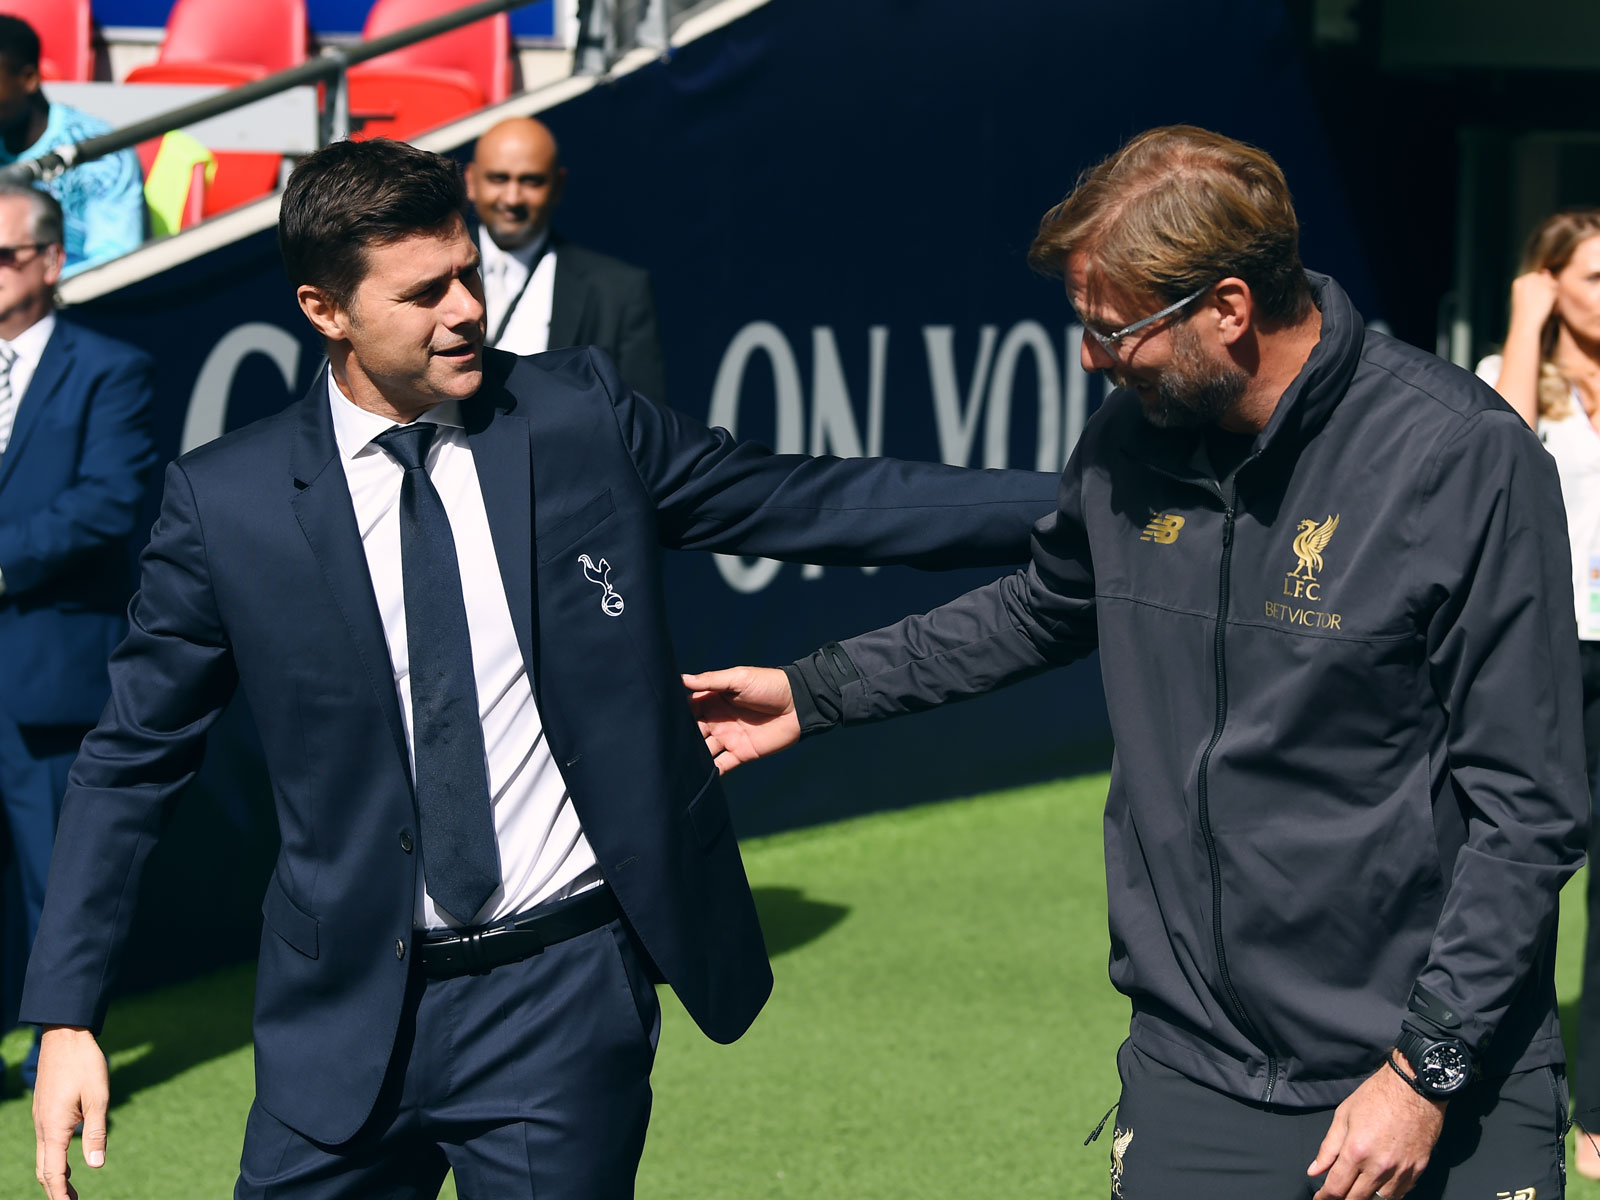 Mauricio Pochettino and Jurgen Klopp go head-to-head in the Champions League final